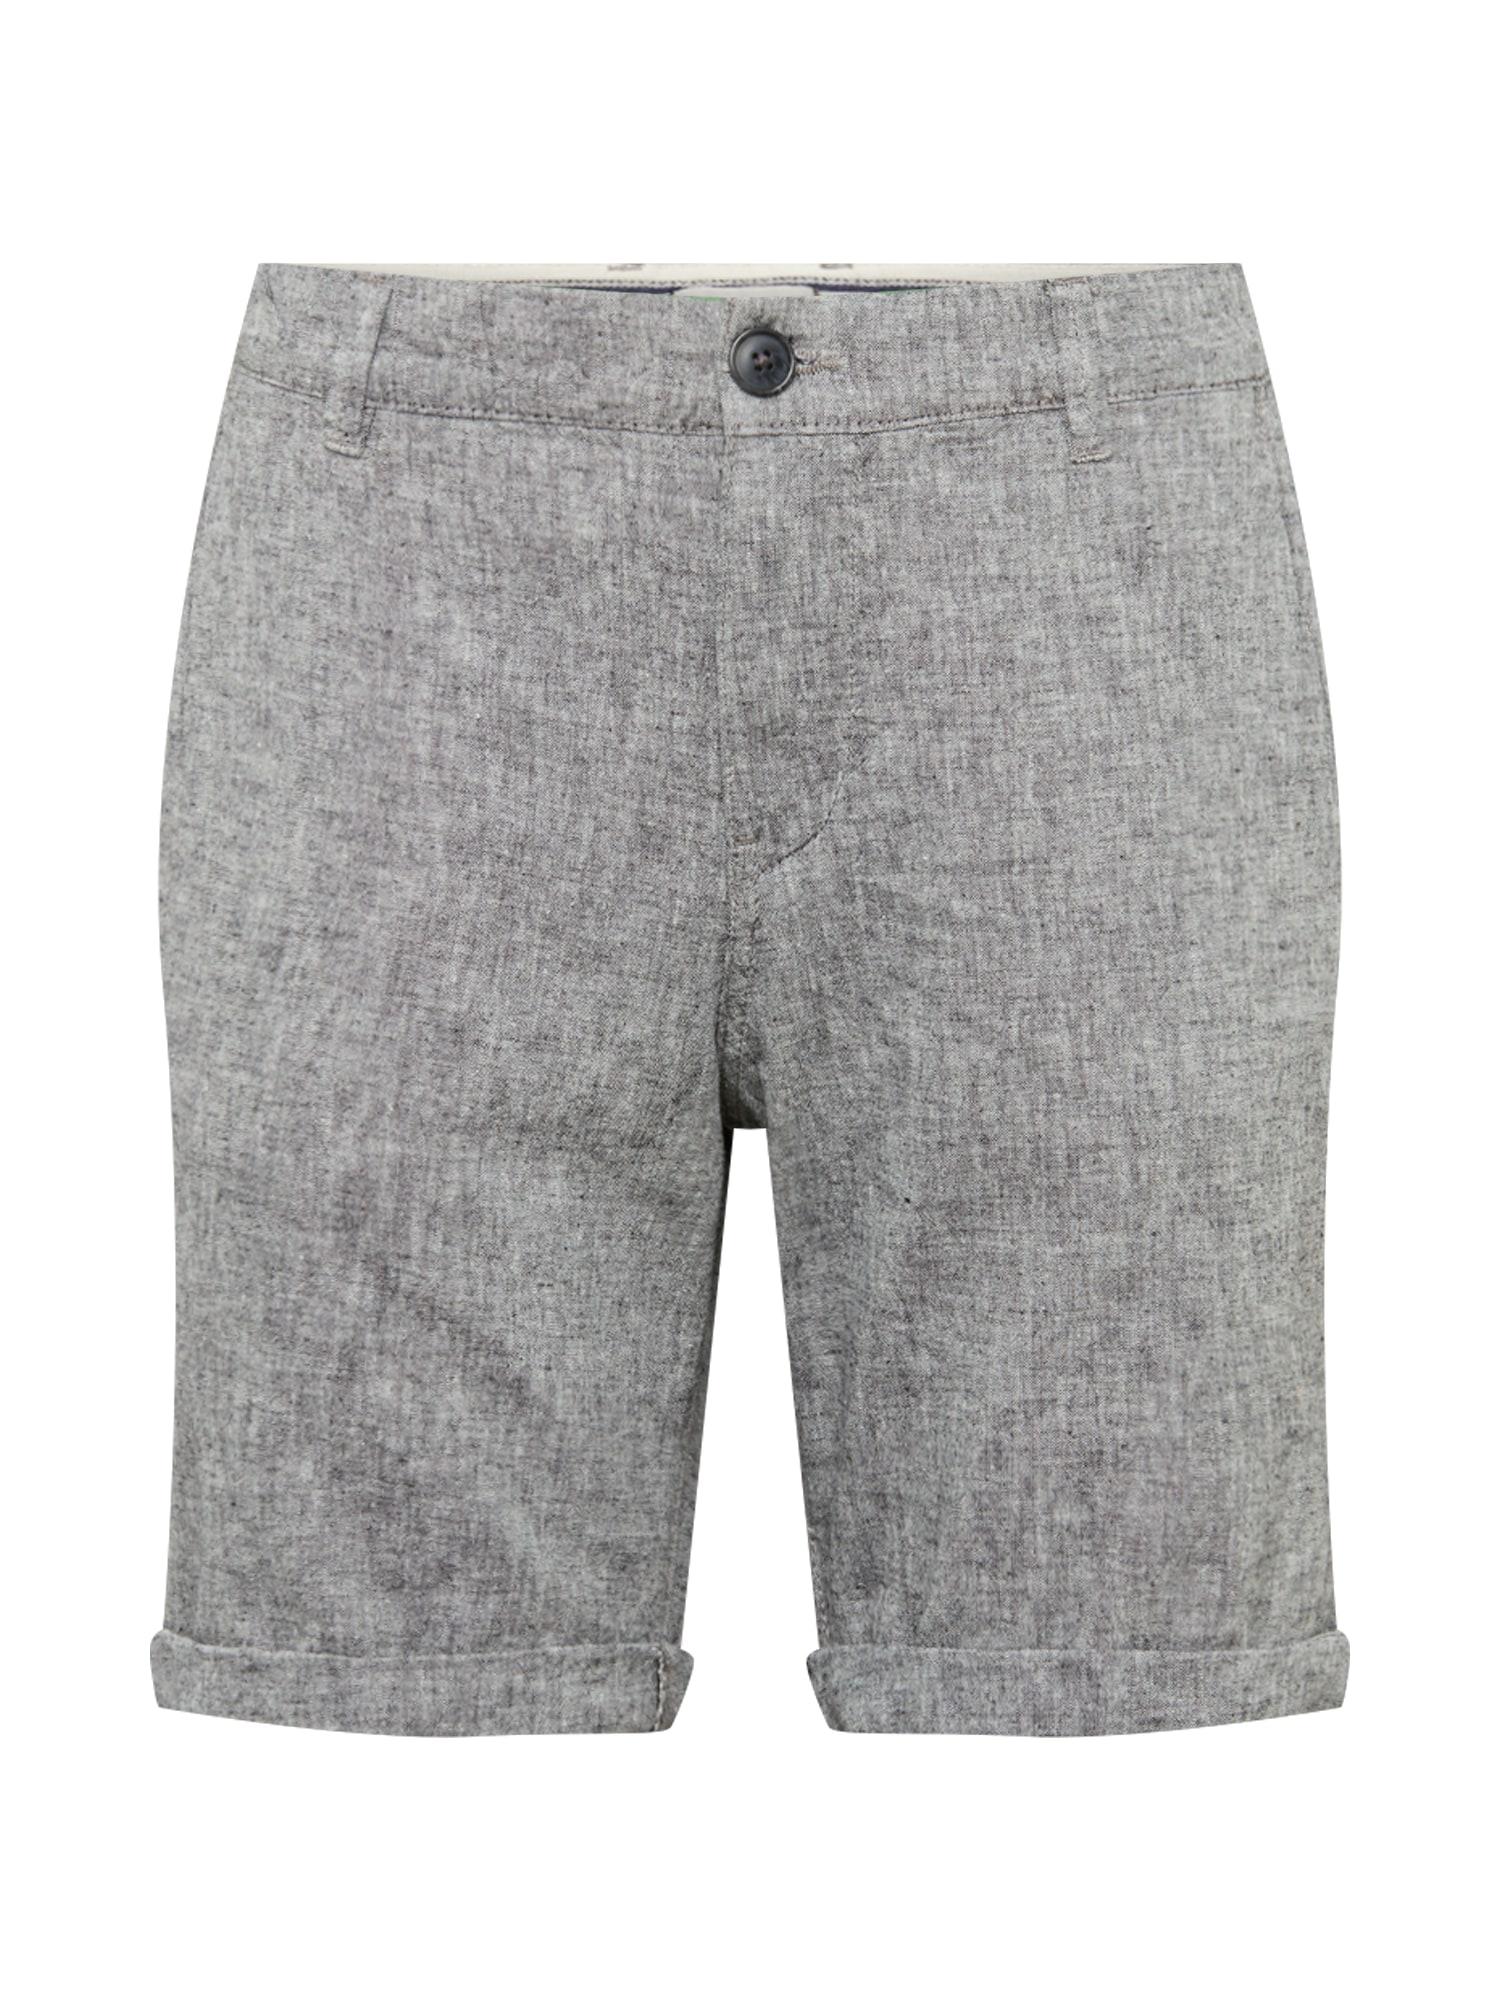 Chino kalhoty Paris tmavě šedá SELECTED HOMME